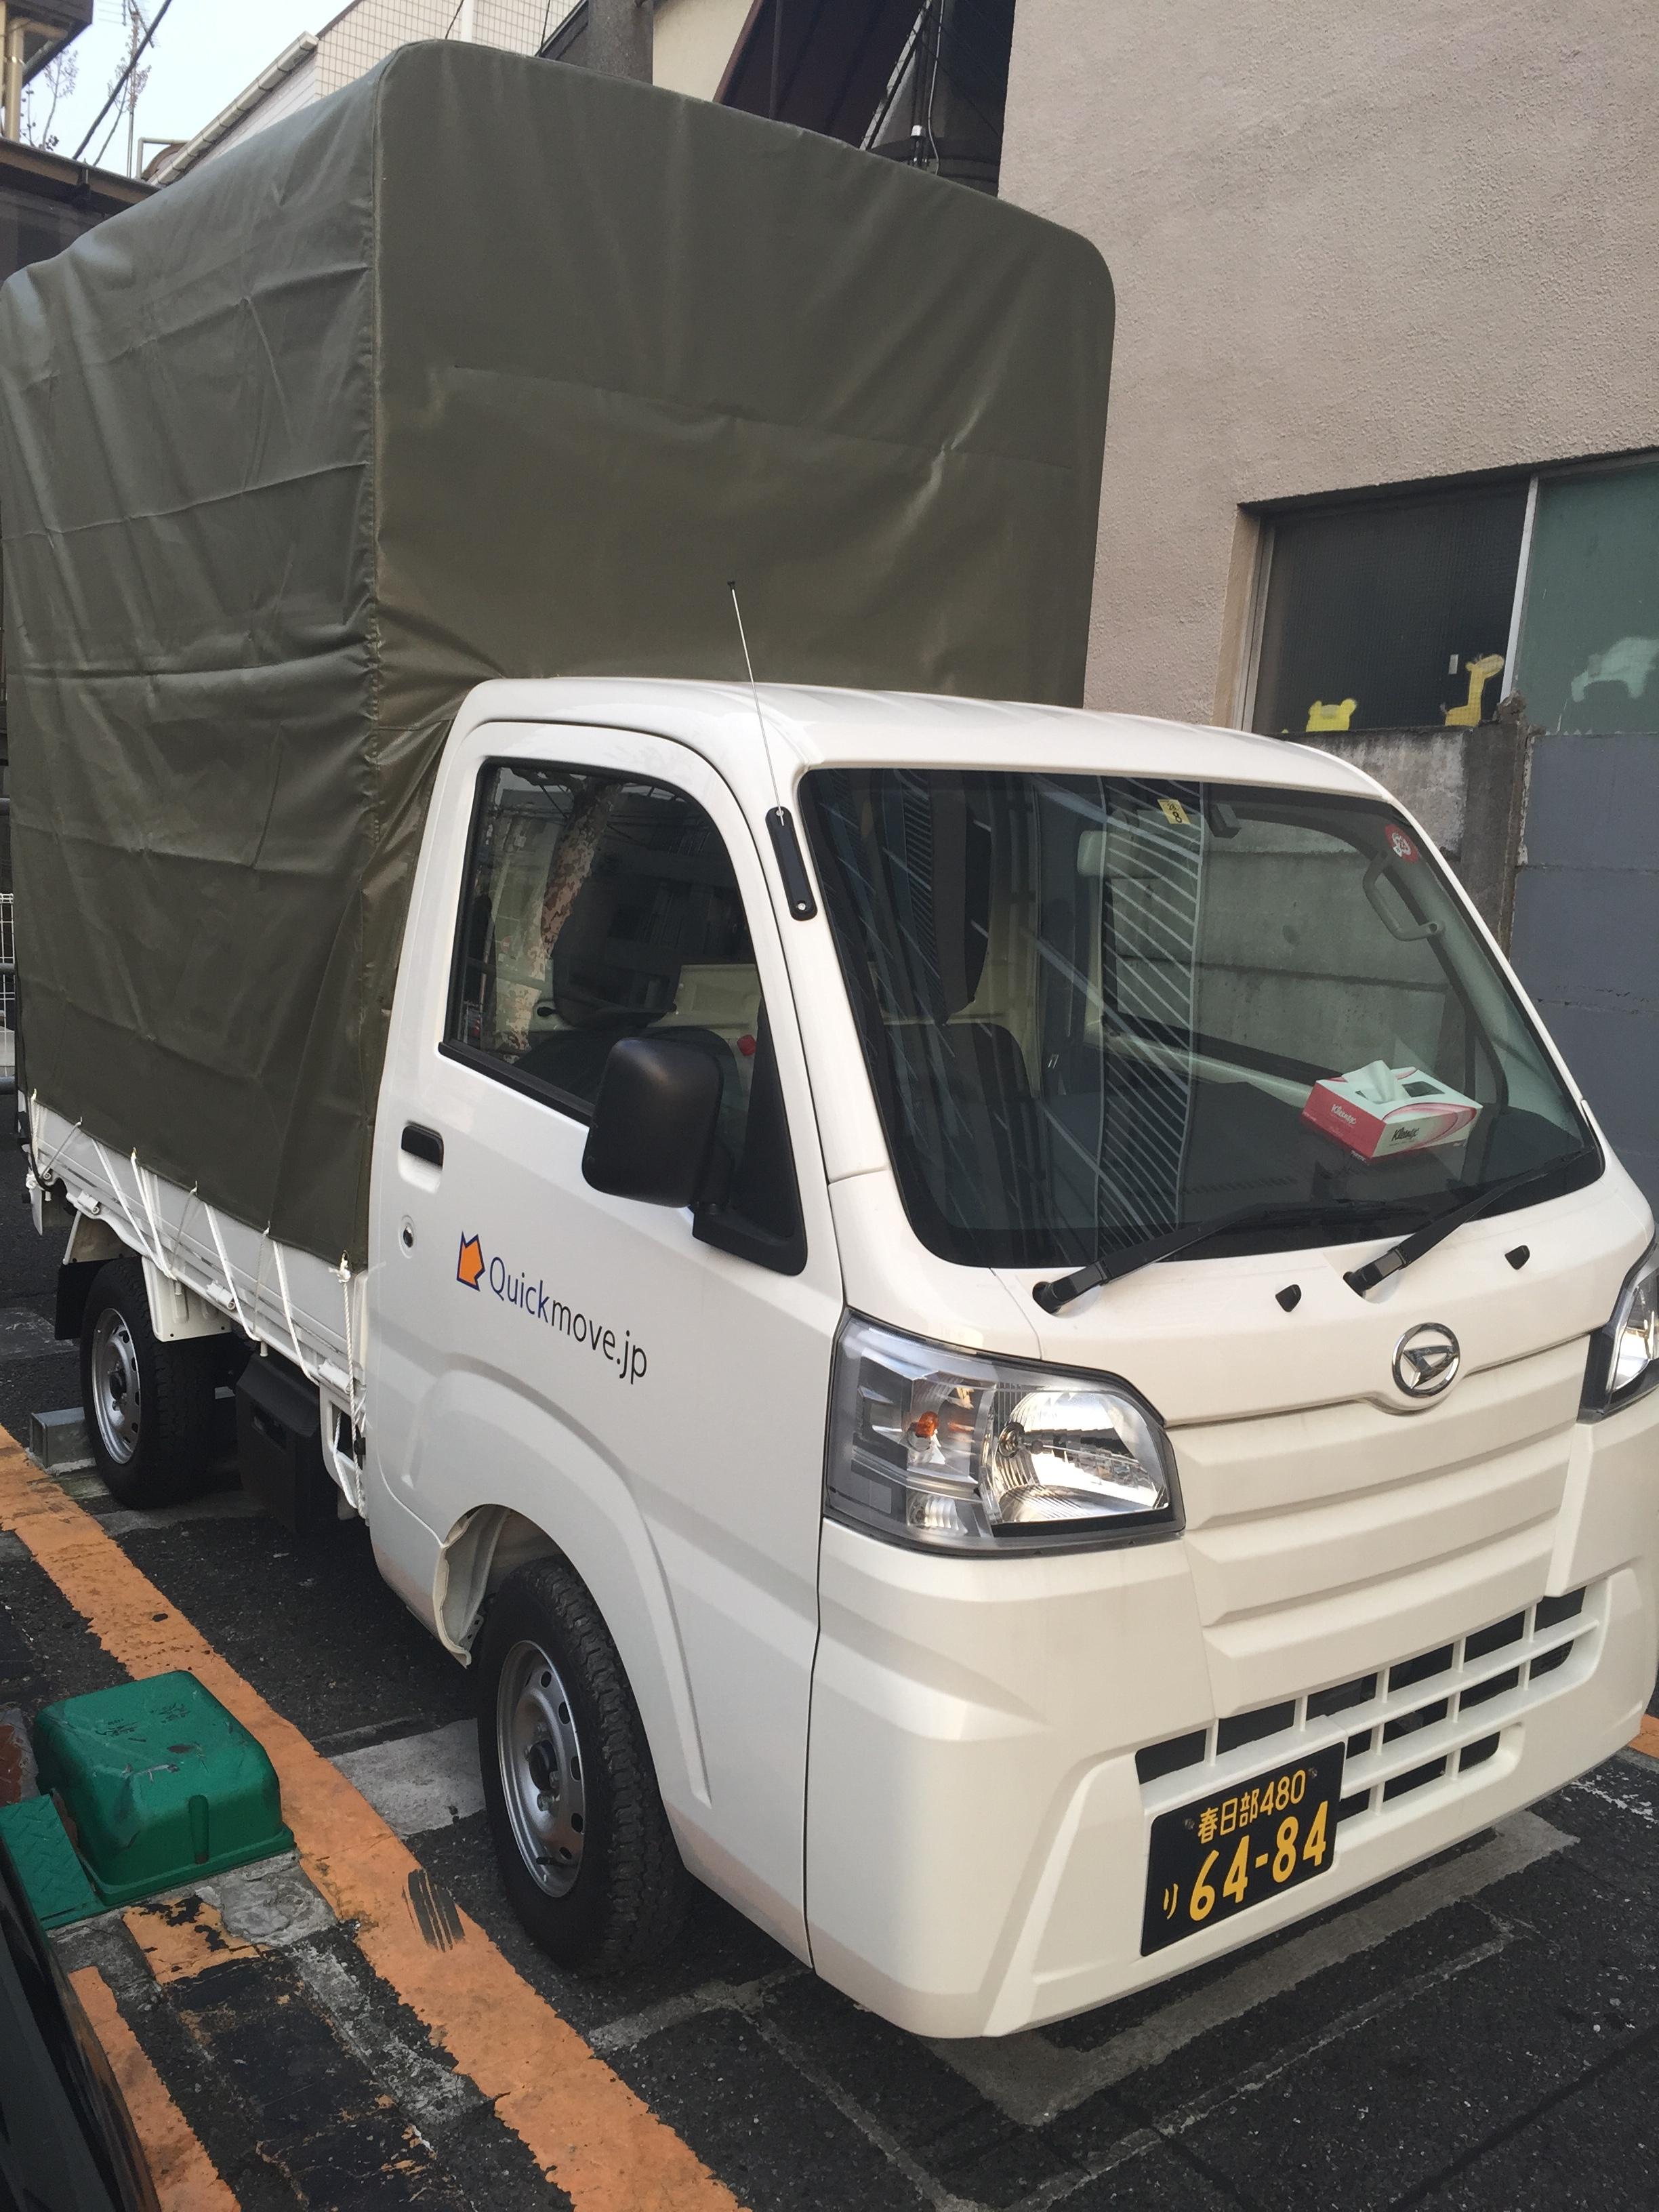 Trucks are 200x200x140 cm